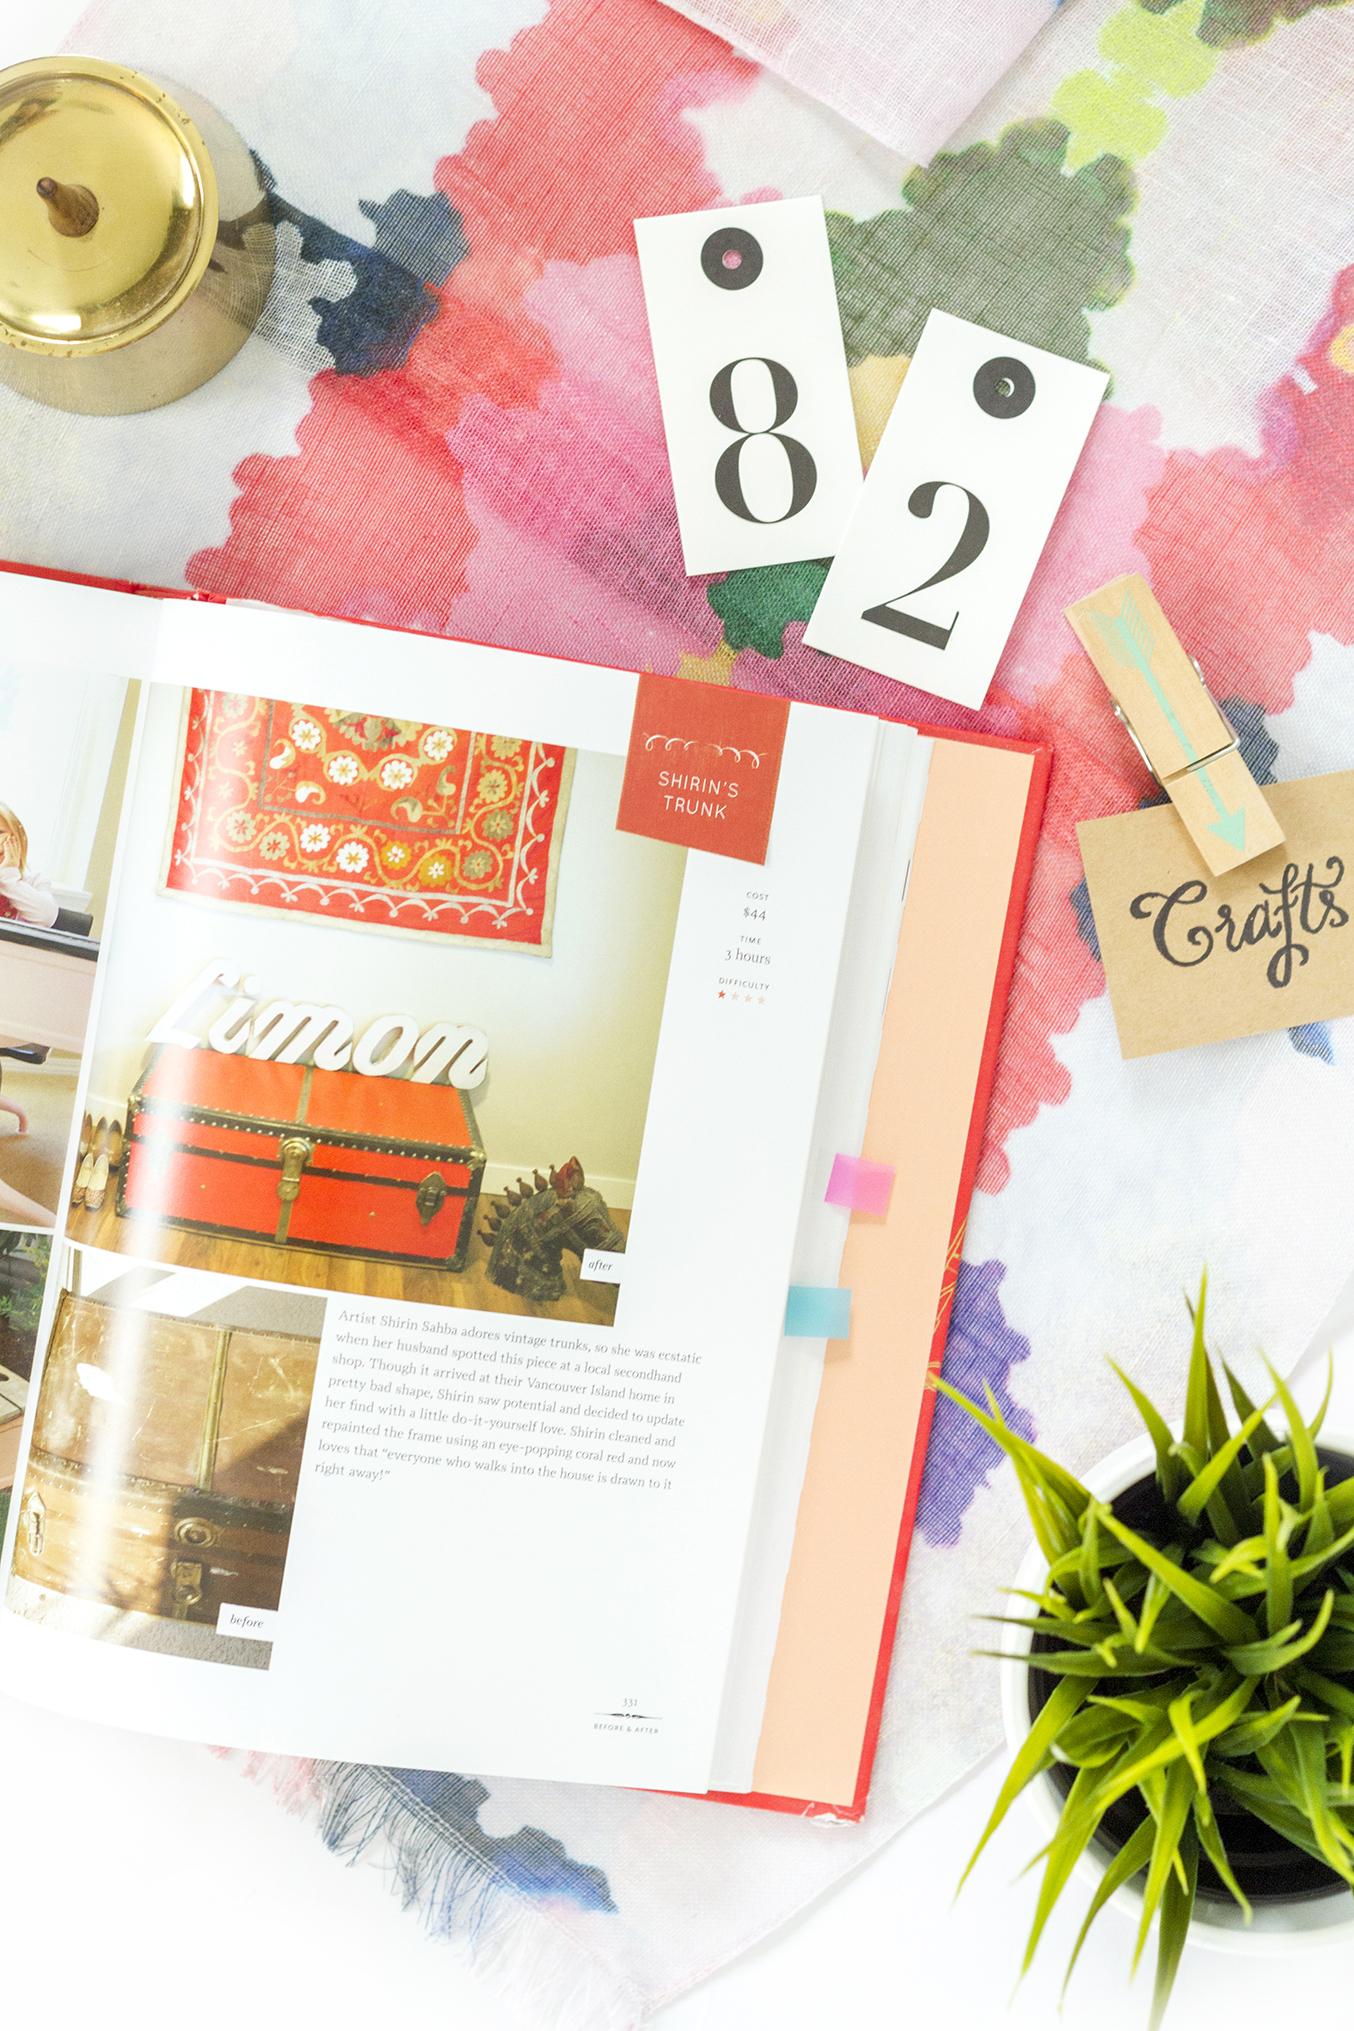 Book design sponge at home house design plans - House design book ...